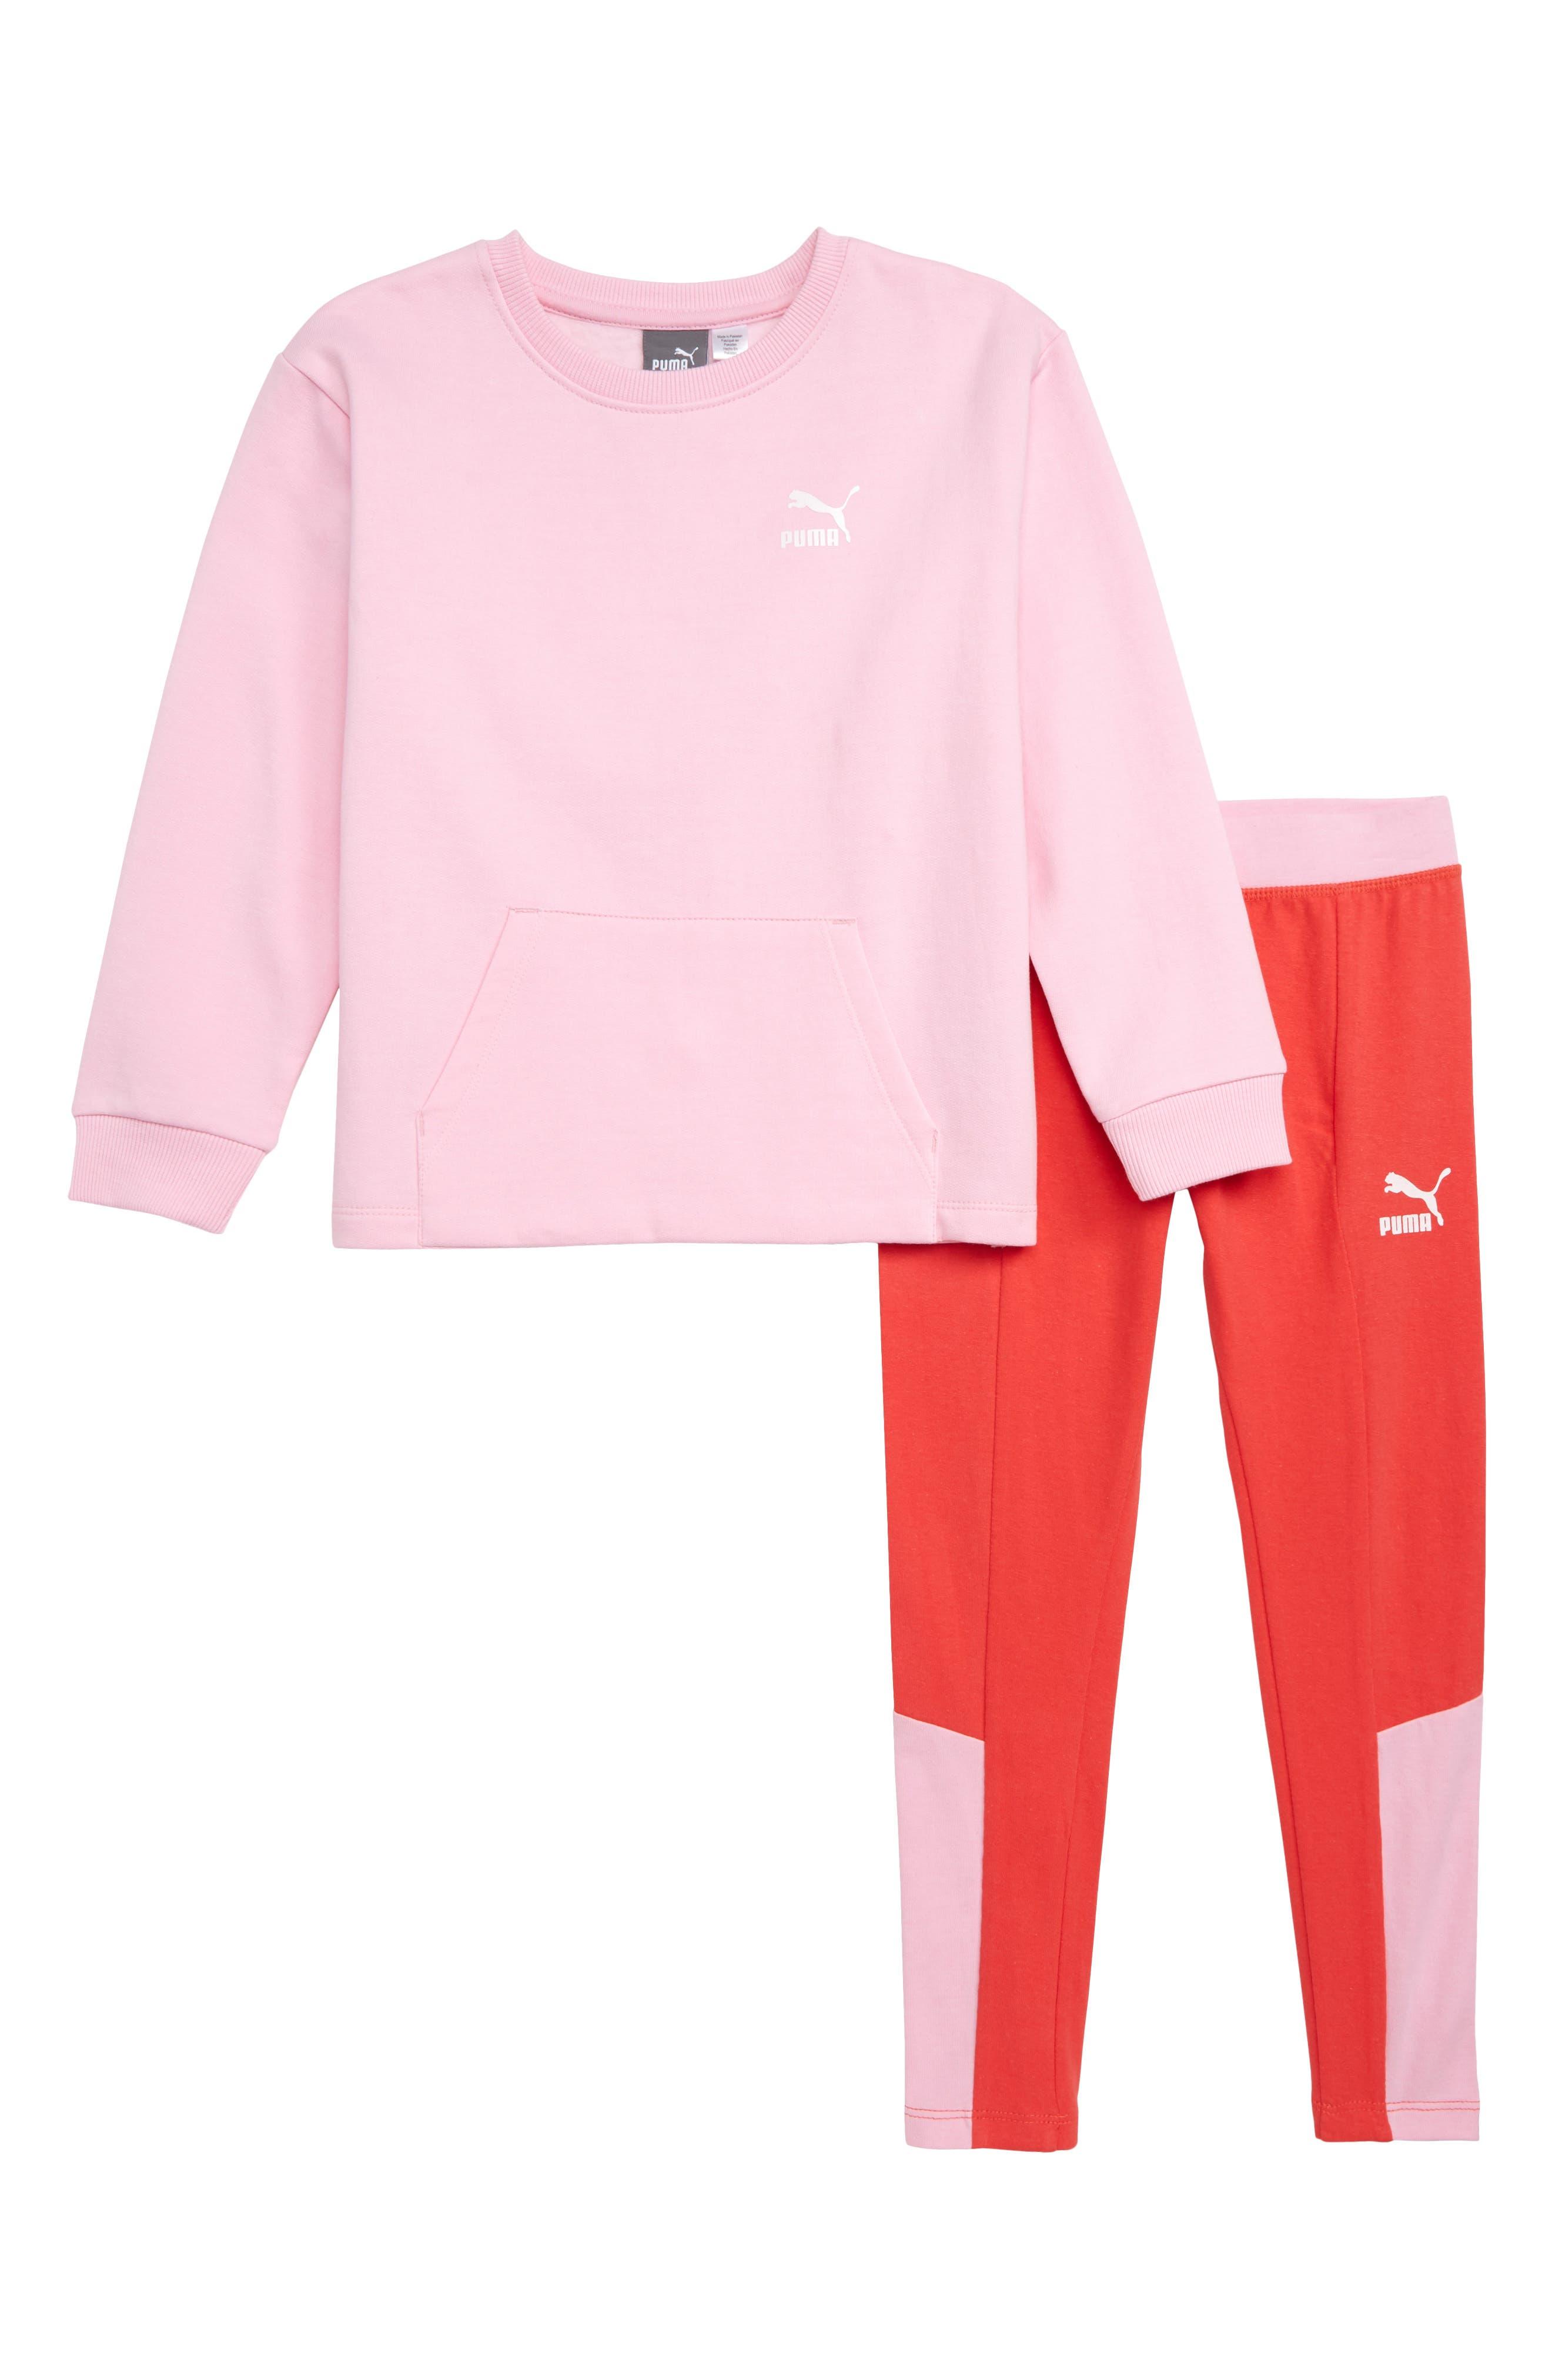 Girls Puma Graphic Sweatshirt  Leggings Set